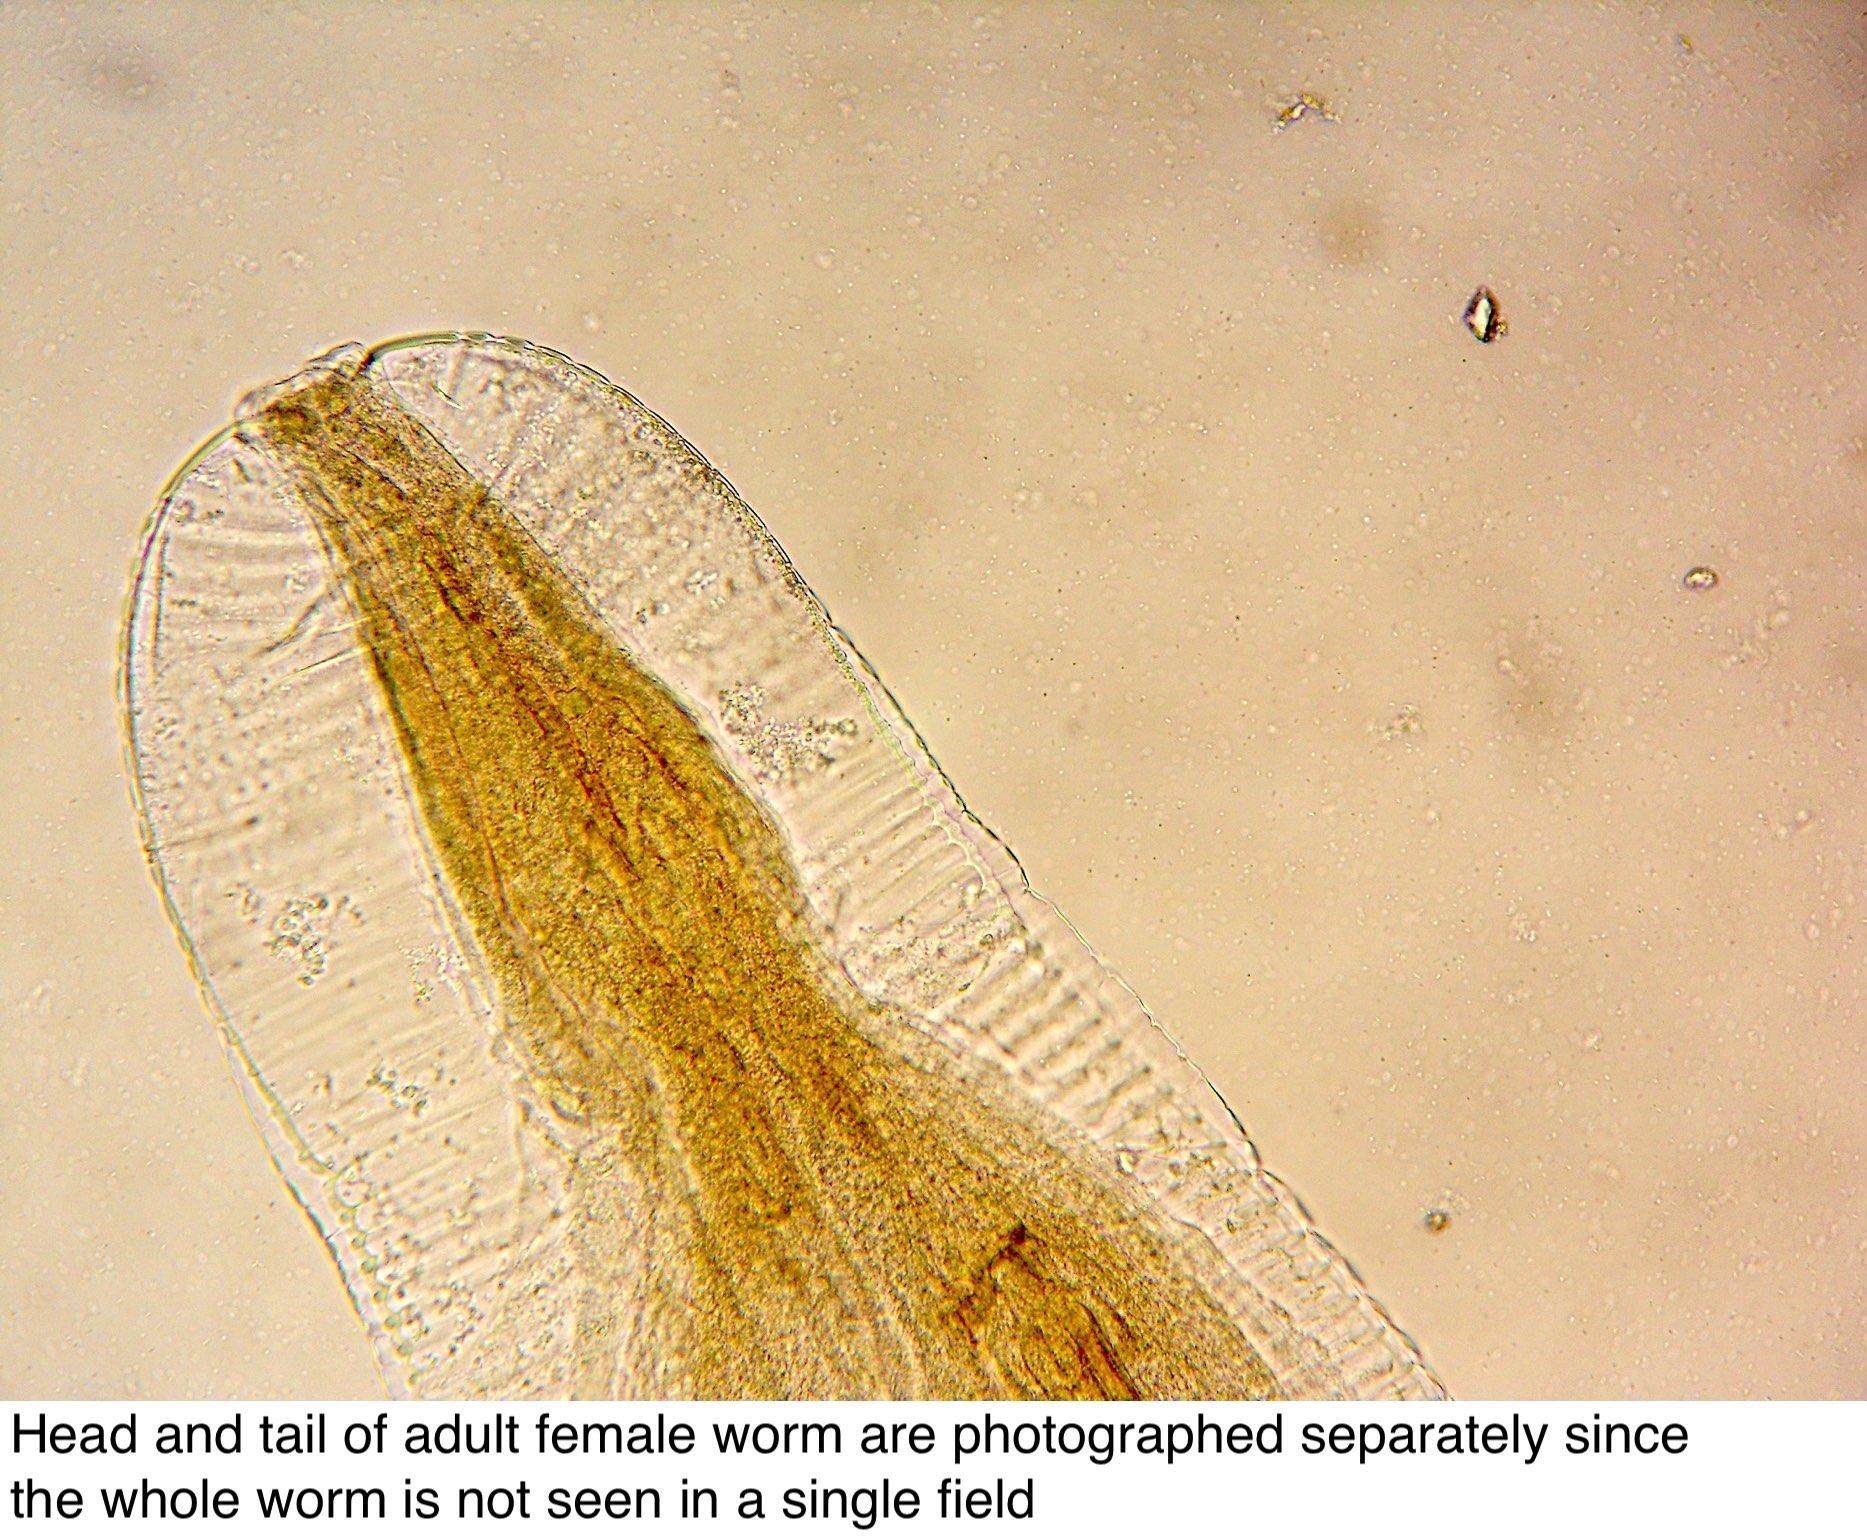 enterobius vermicularis vagy oxyure